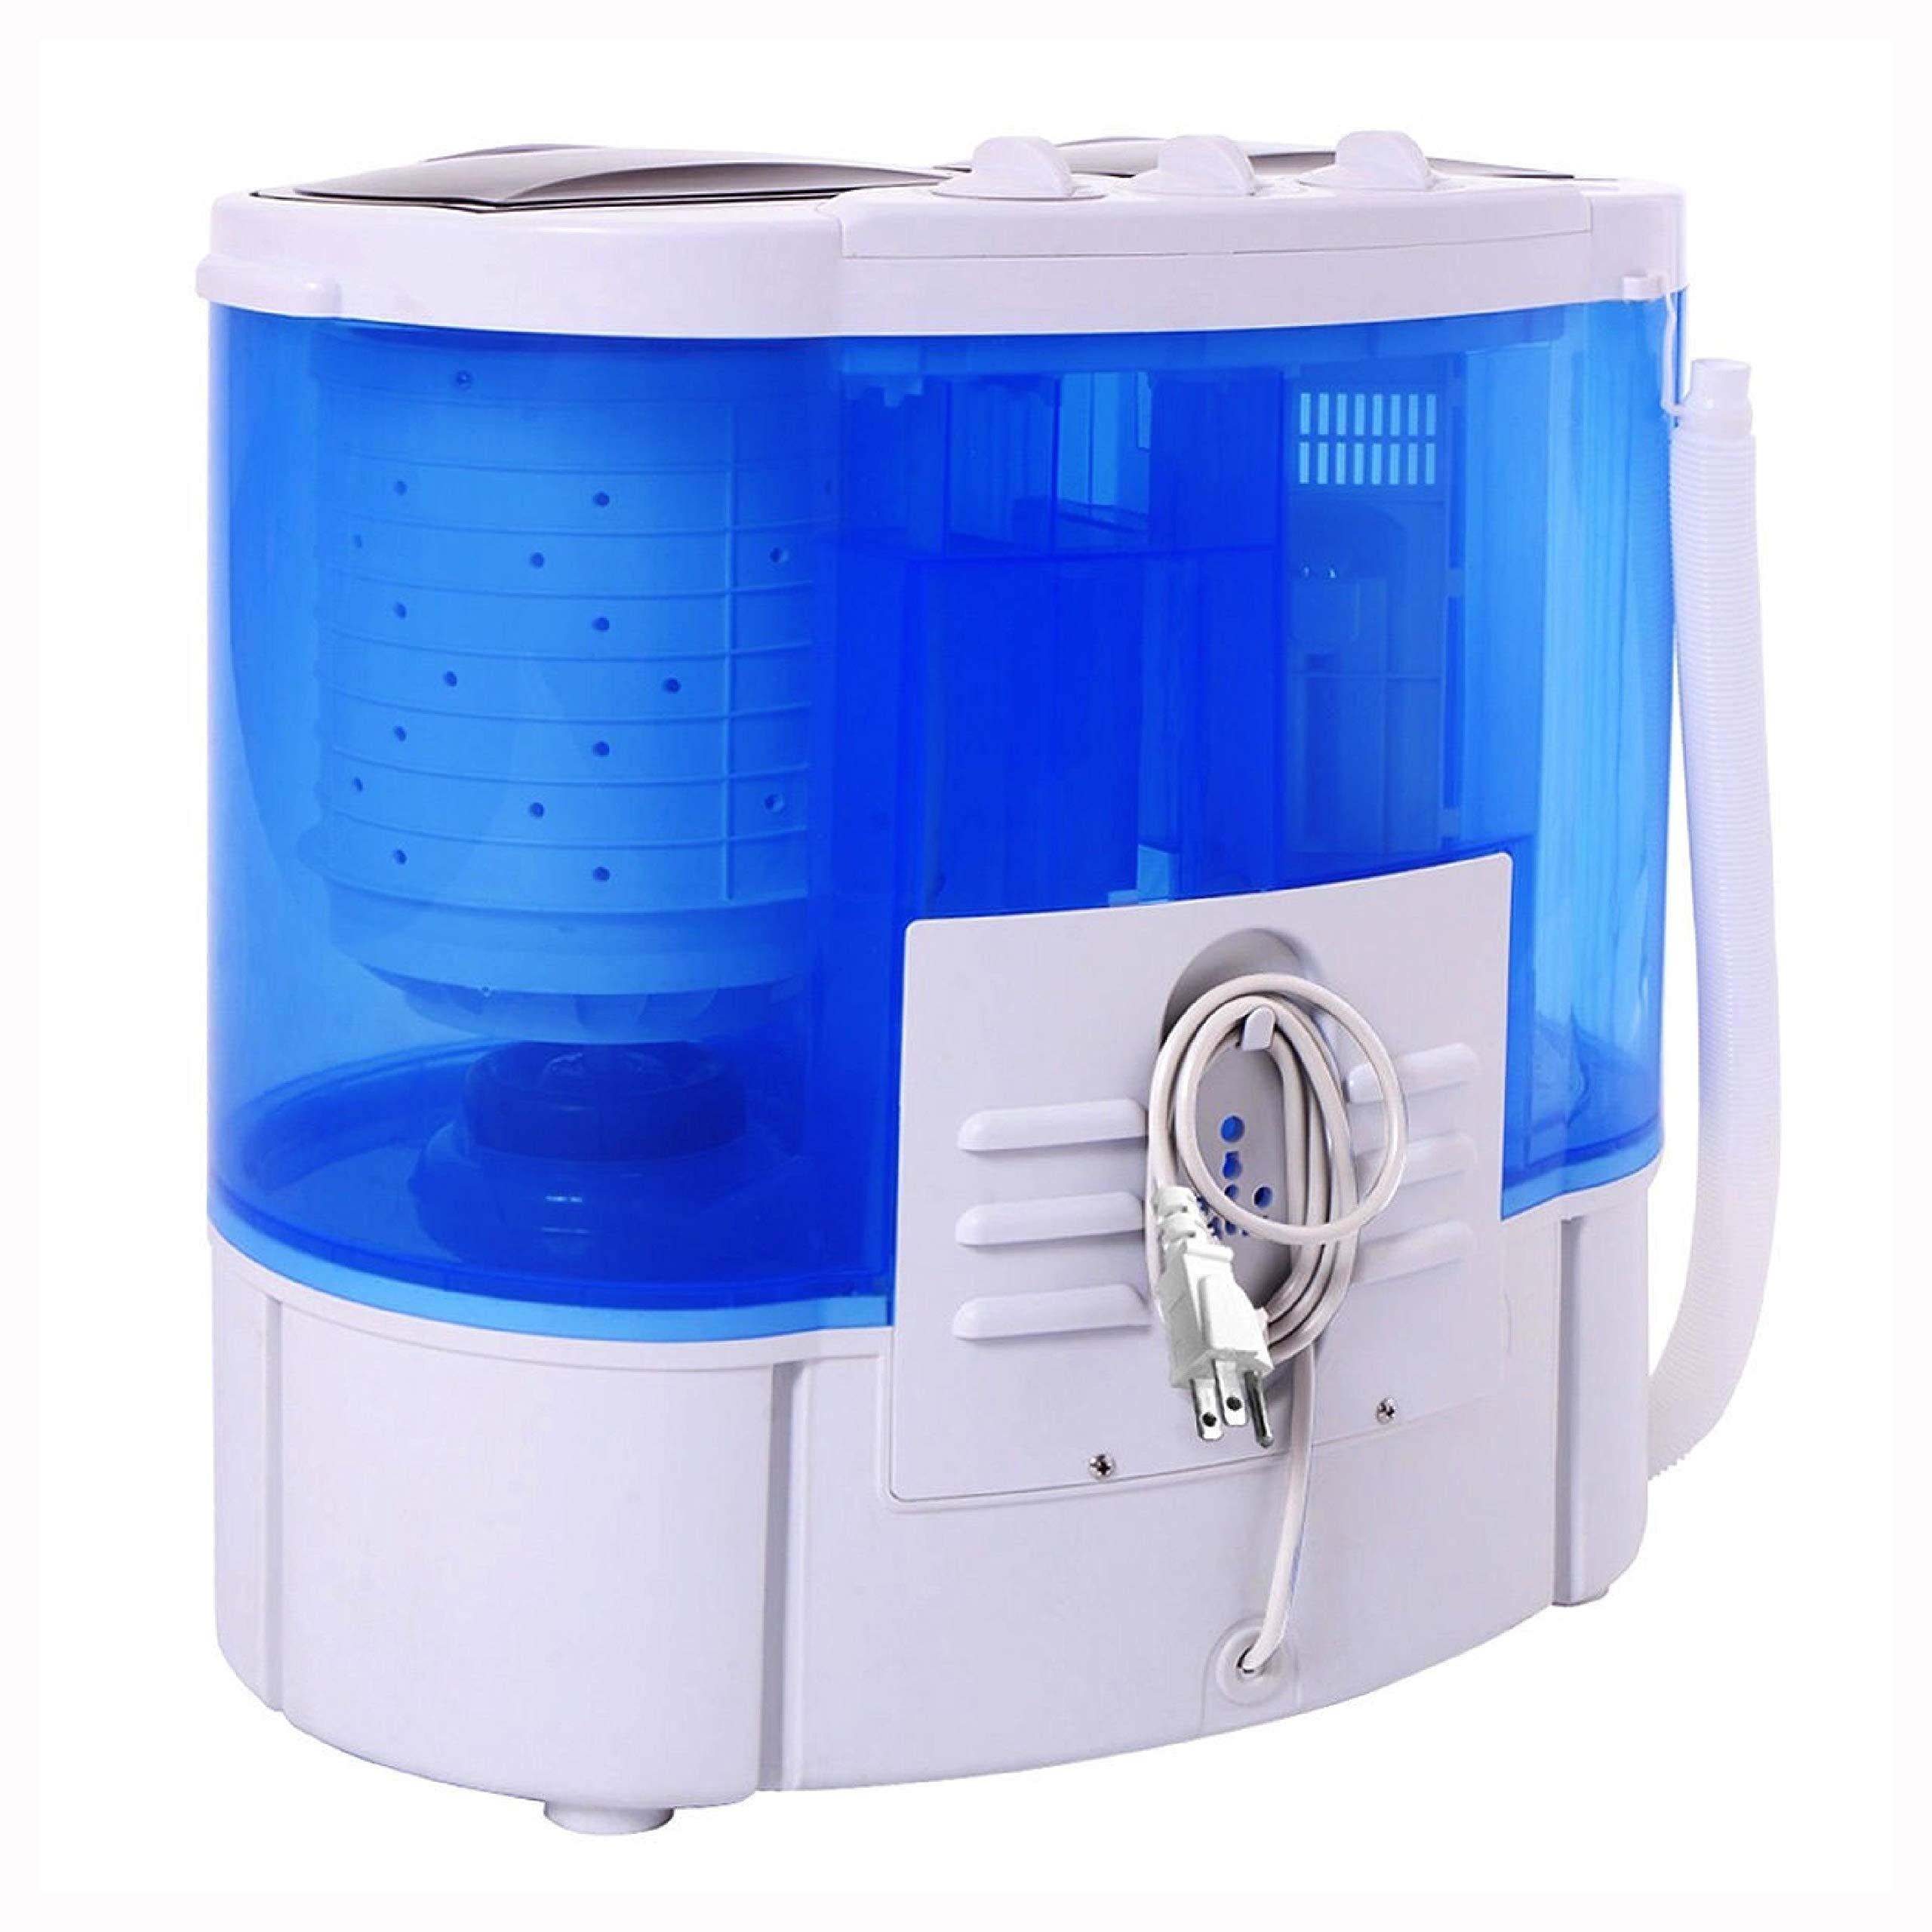 Washing Machine, 15 lbs Portable Compact Twin Tub Mini Washing Machine by HomyDelight (Image #3)